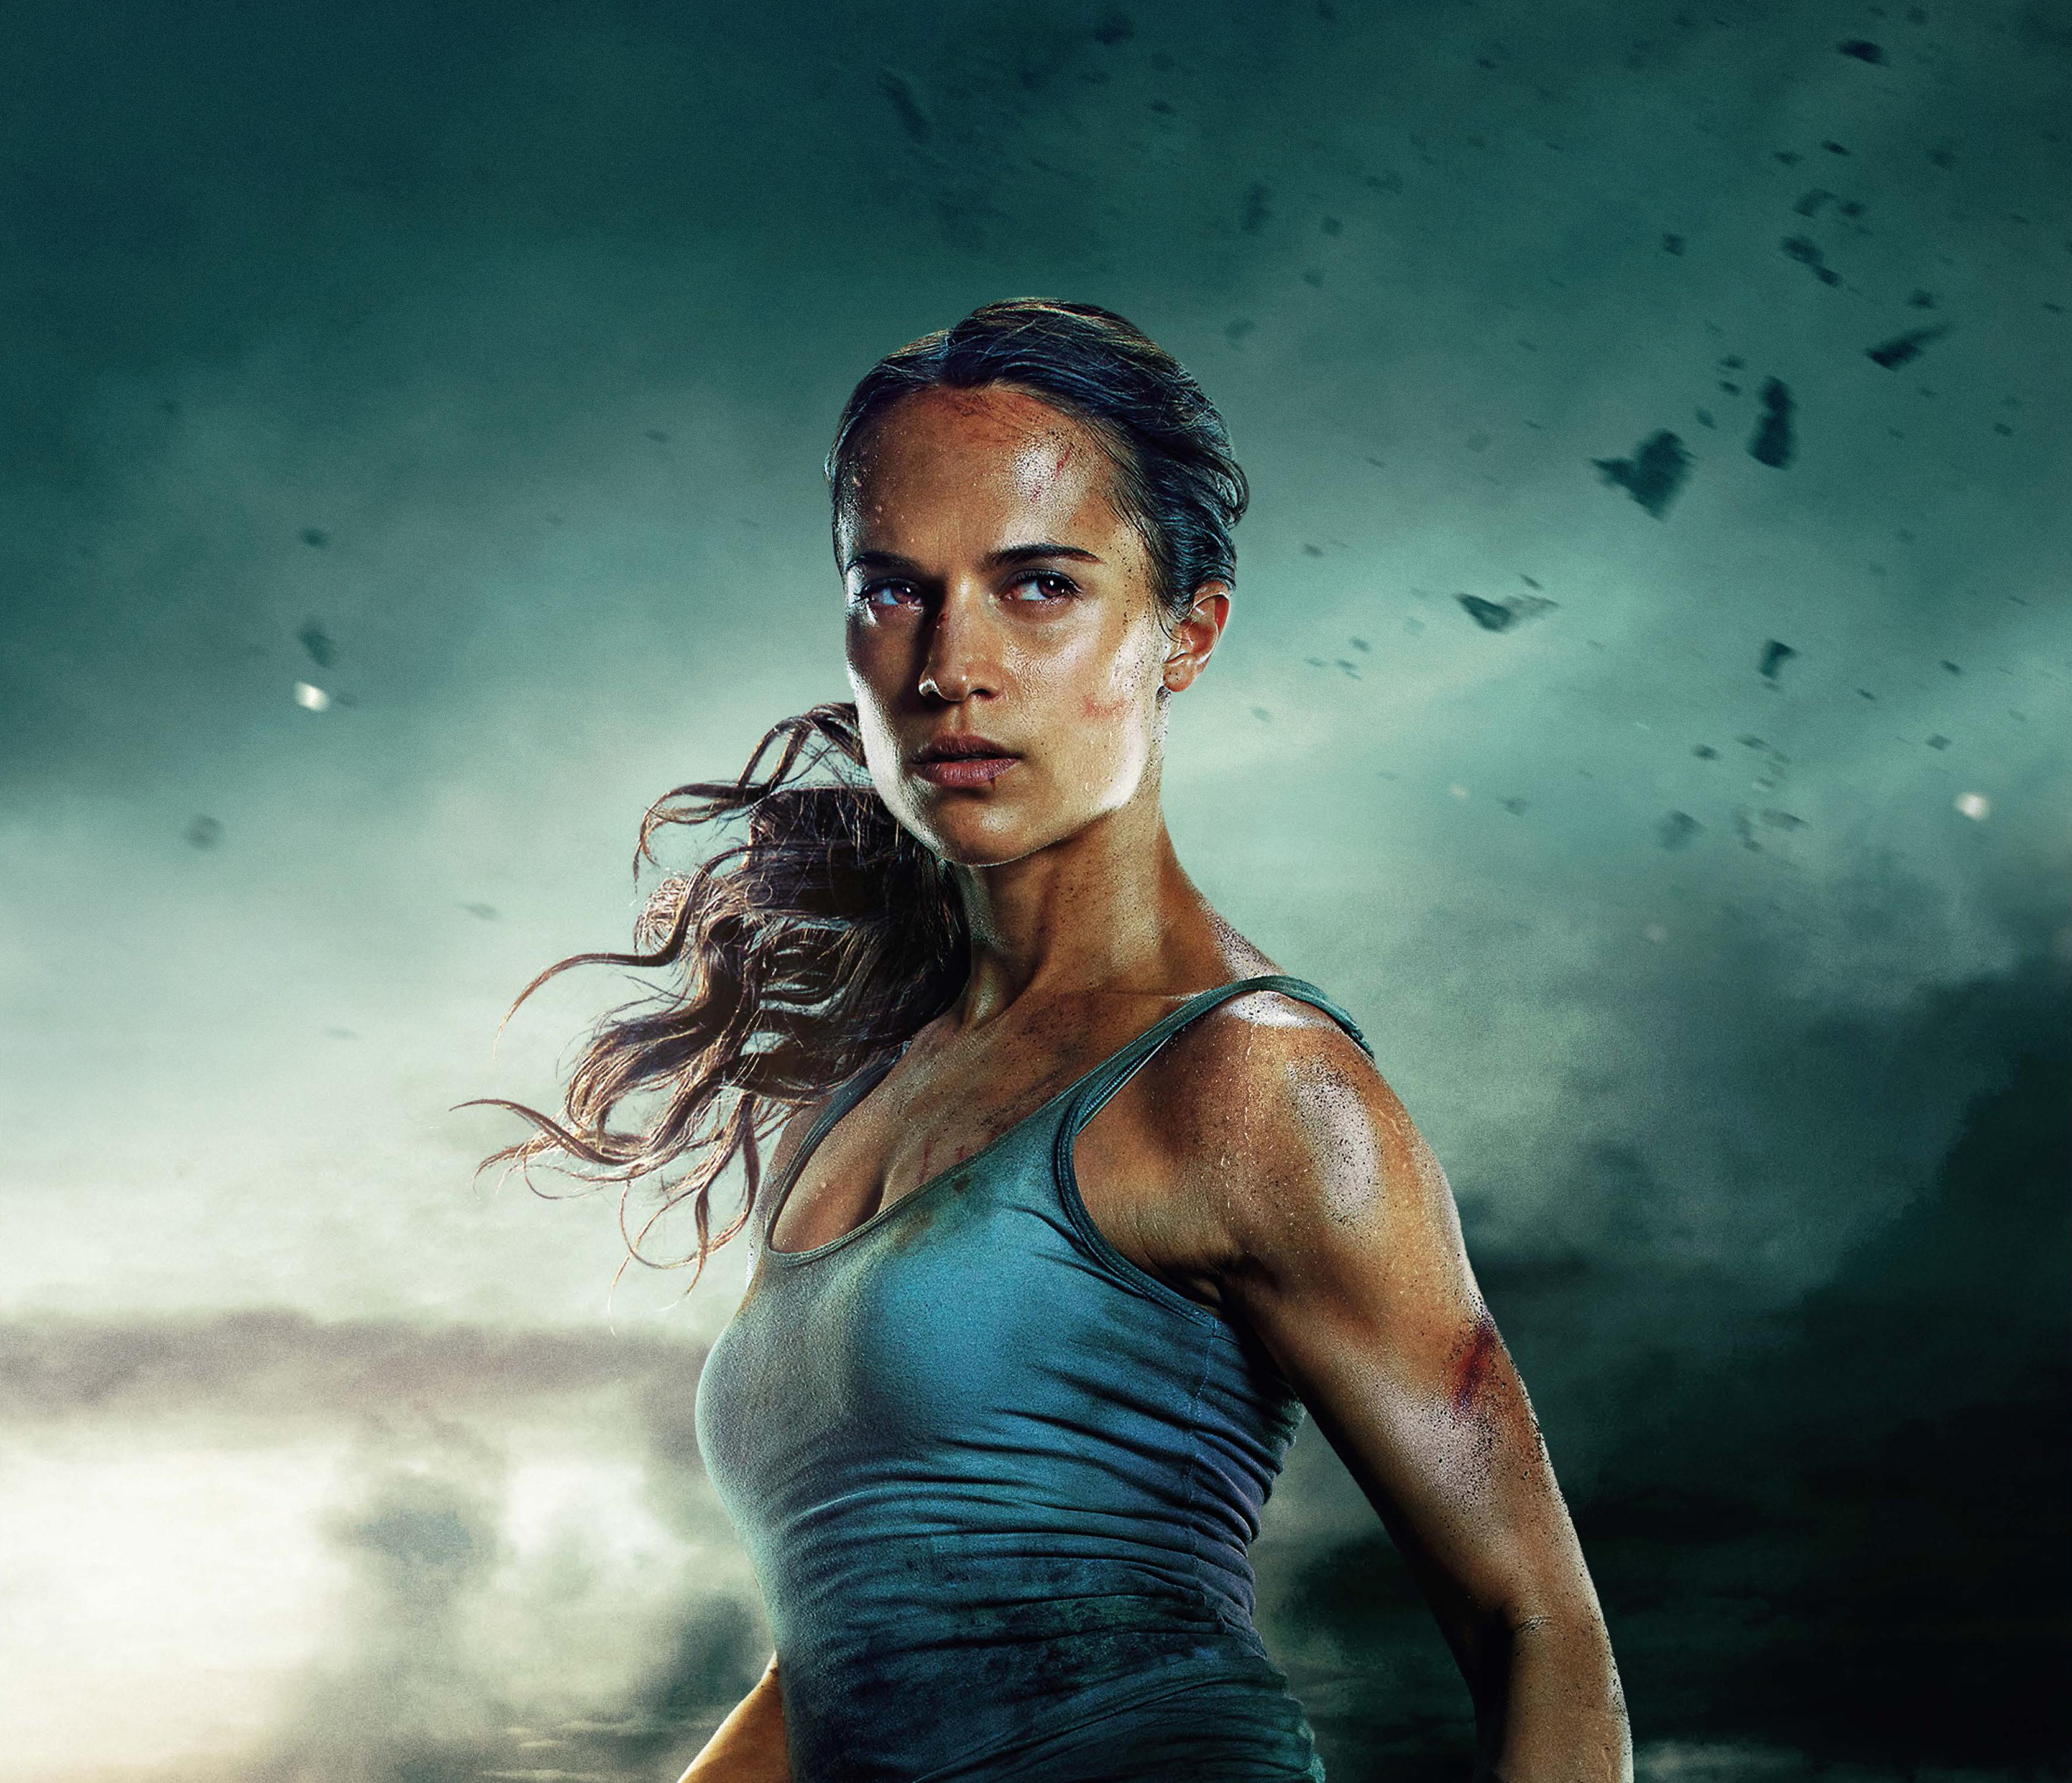 Tomb Raider 1080p Wallpaper: Tomb Raider 2018 Alicia Vikander 4k, HD Movies, 4k